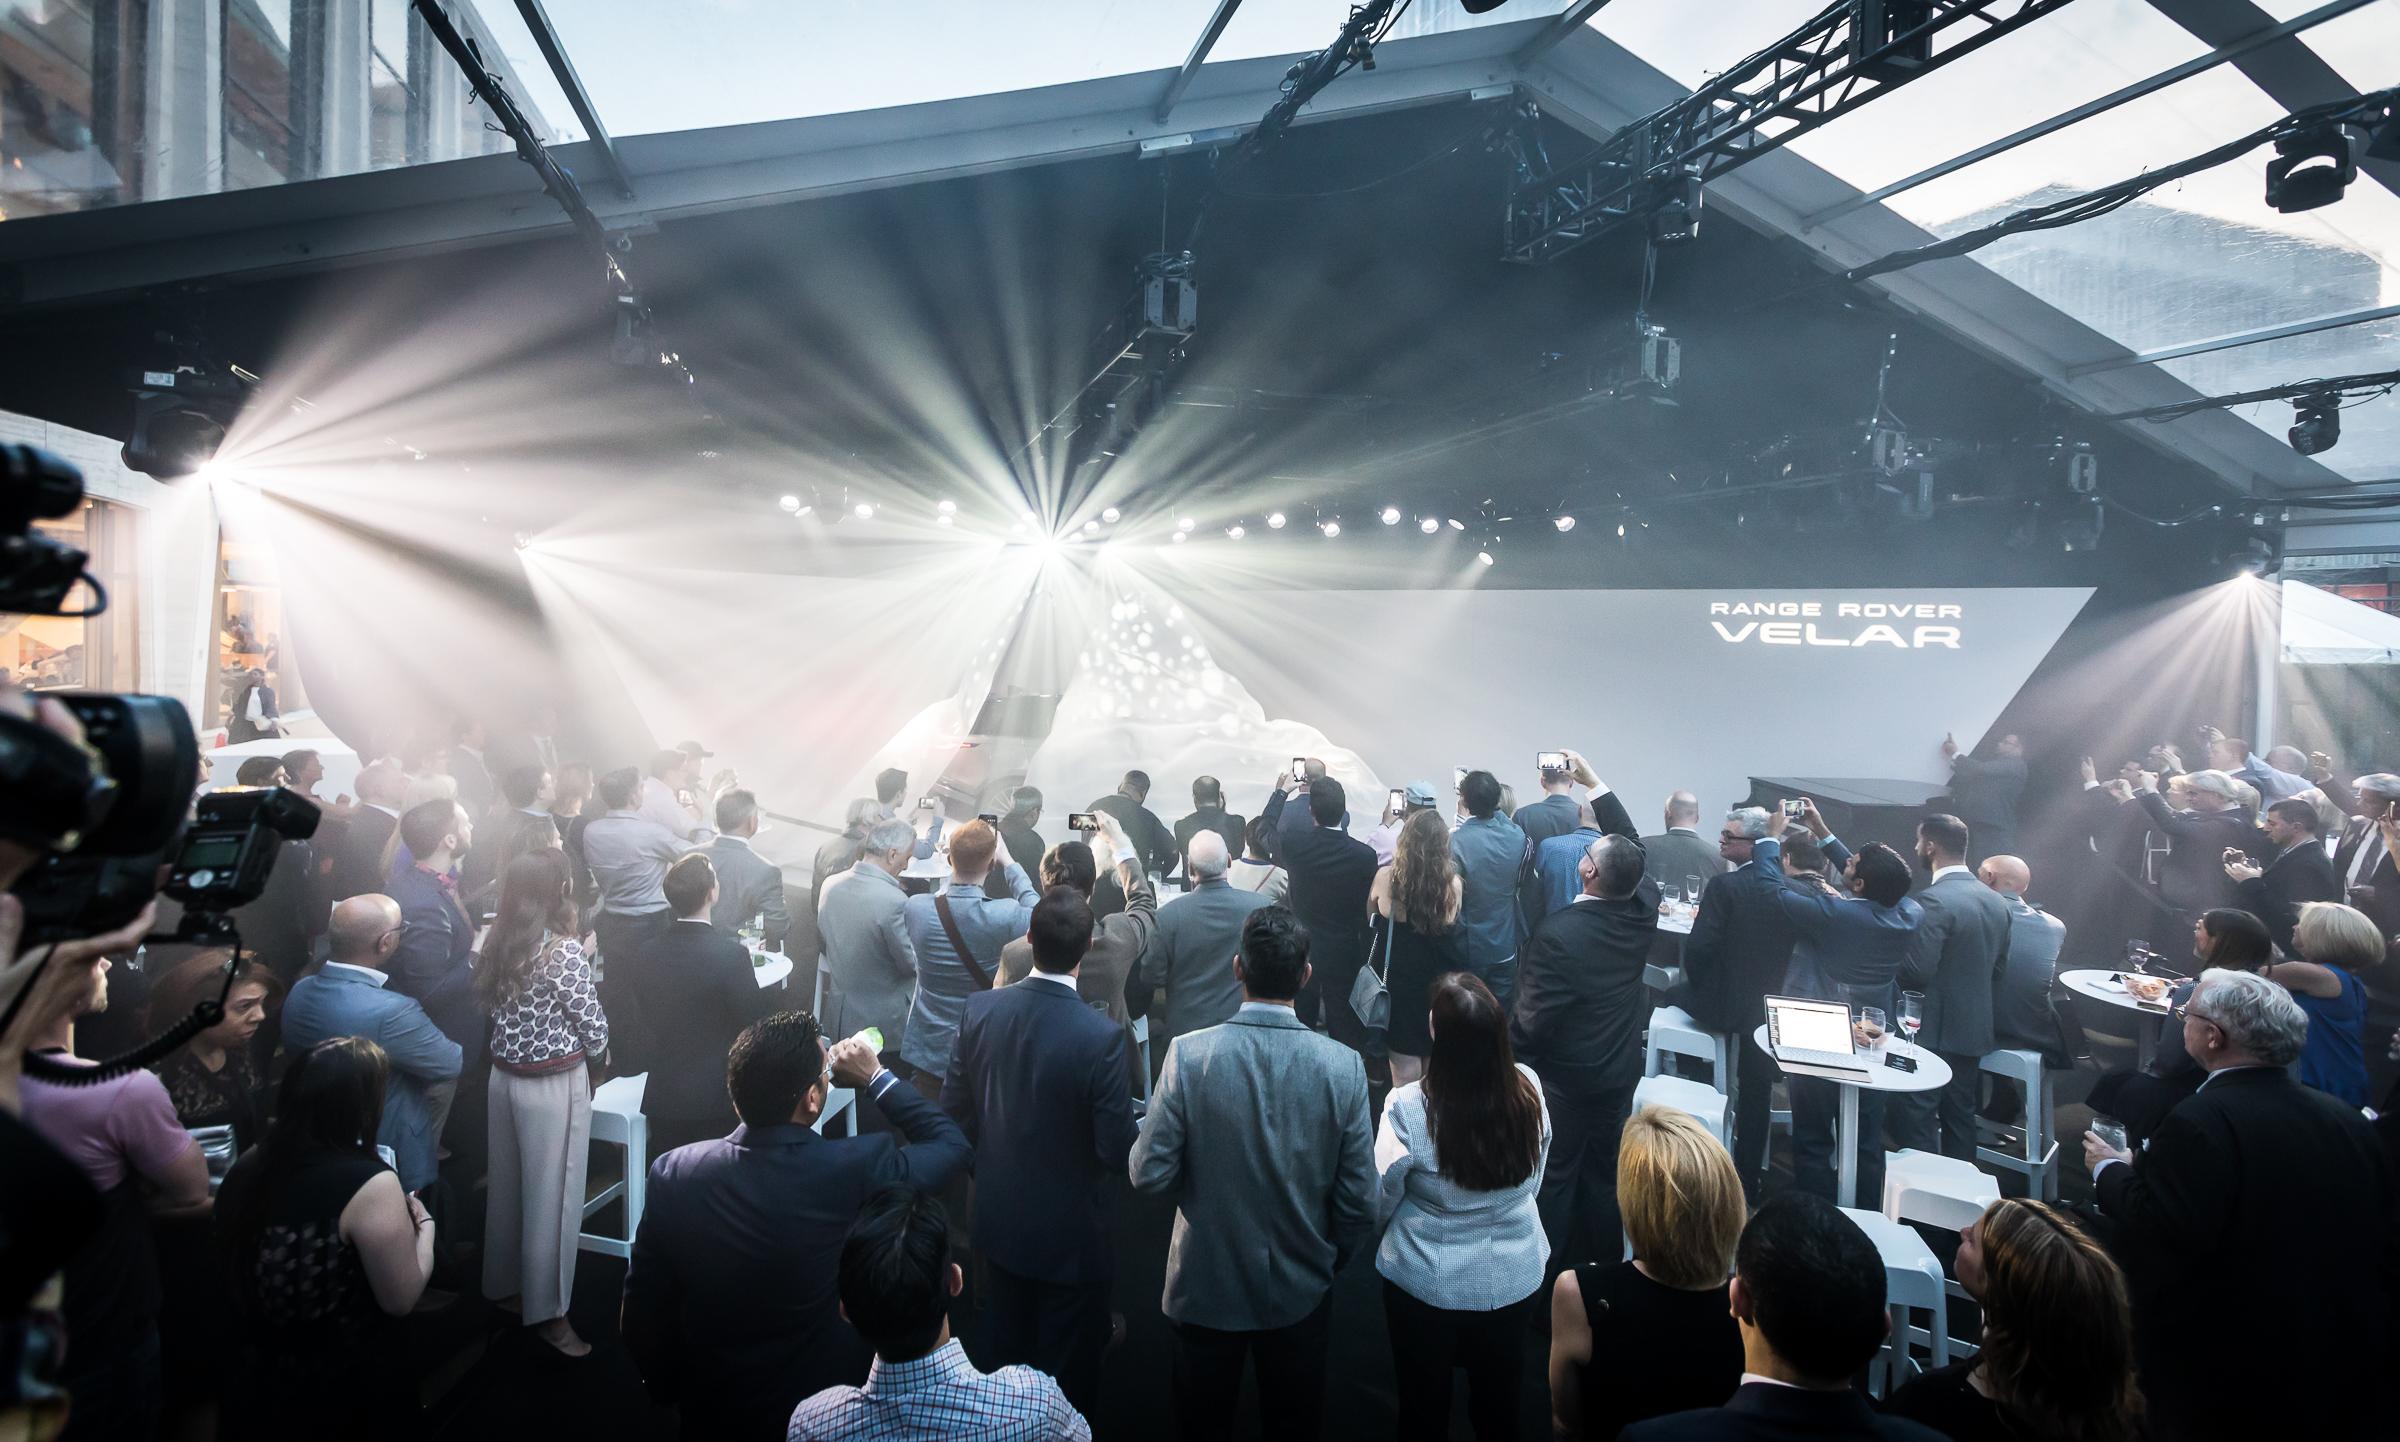 Range Rover Velar Launch - Lincoln Center NYC